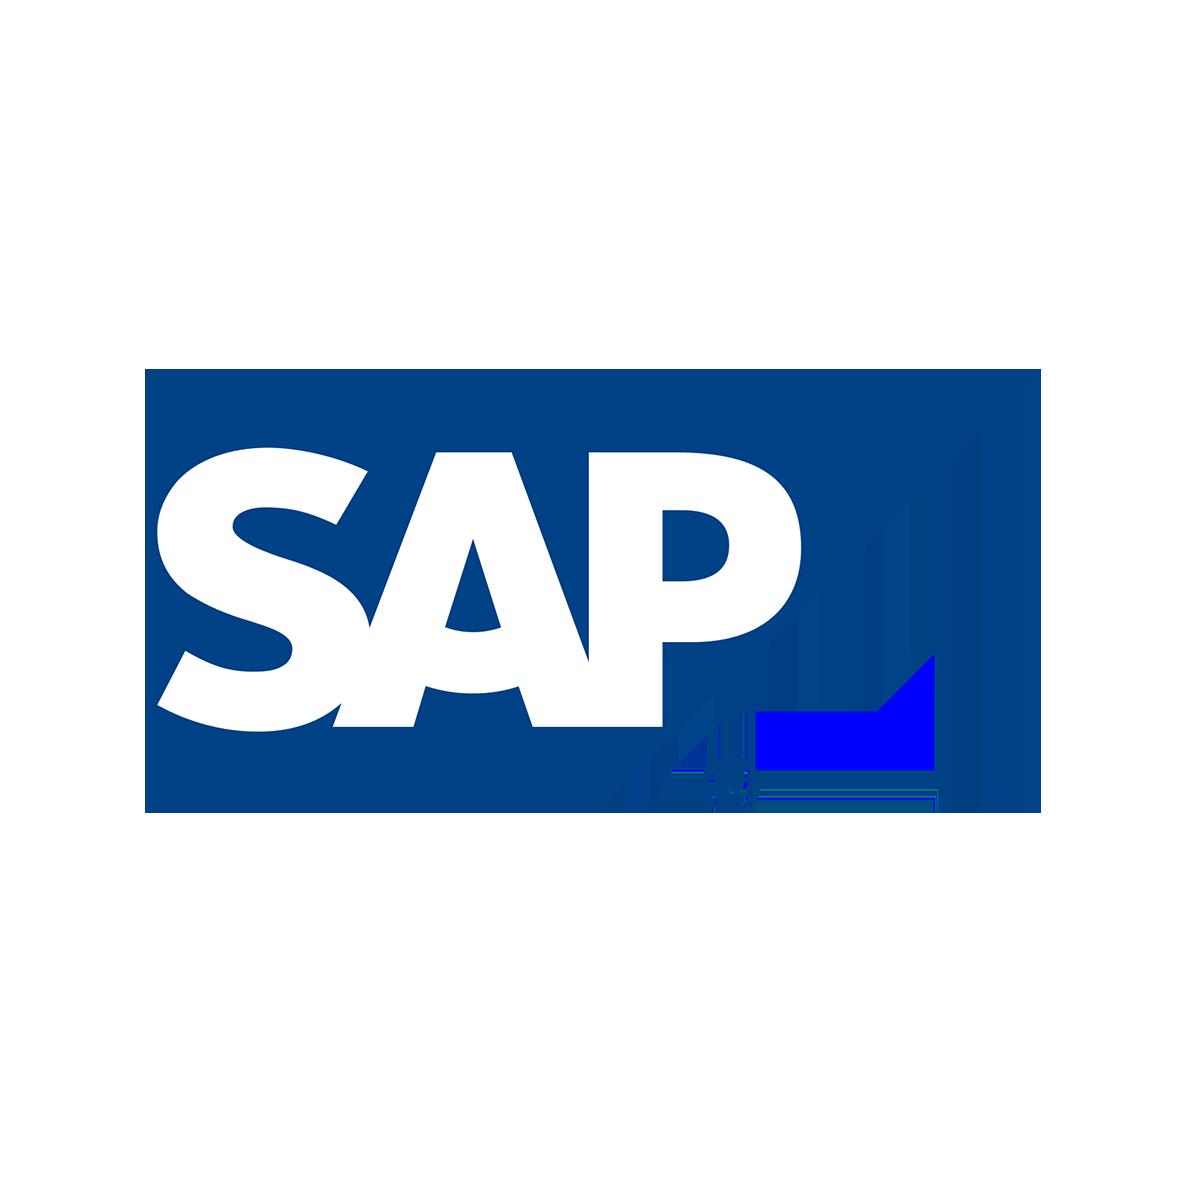 SAP kachel - Schnittstellen